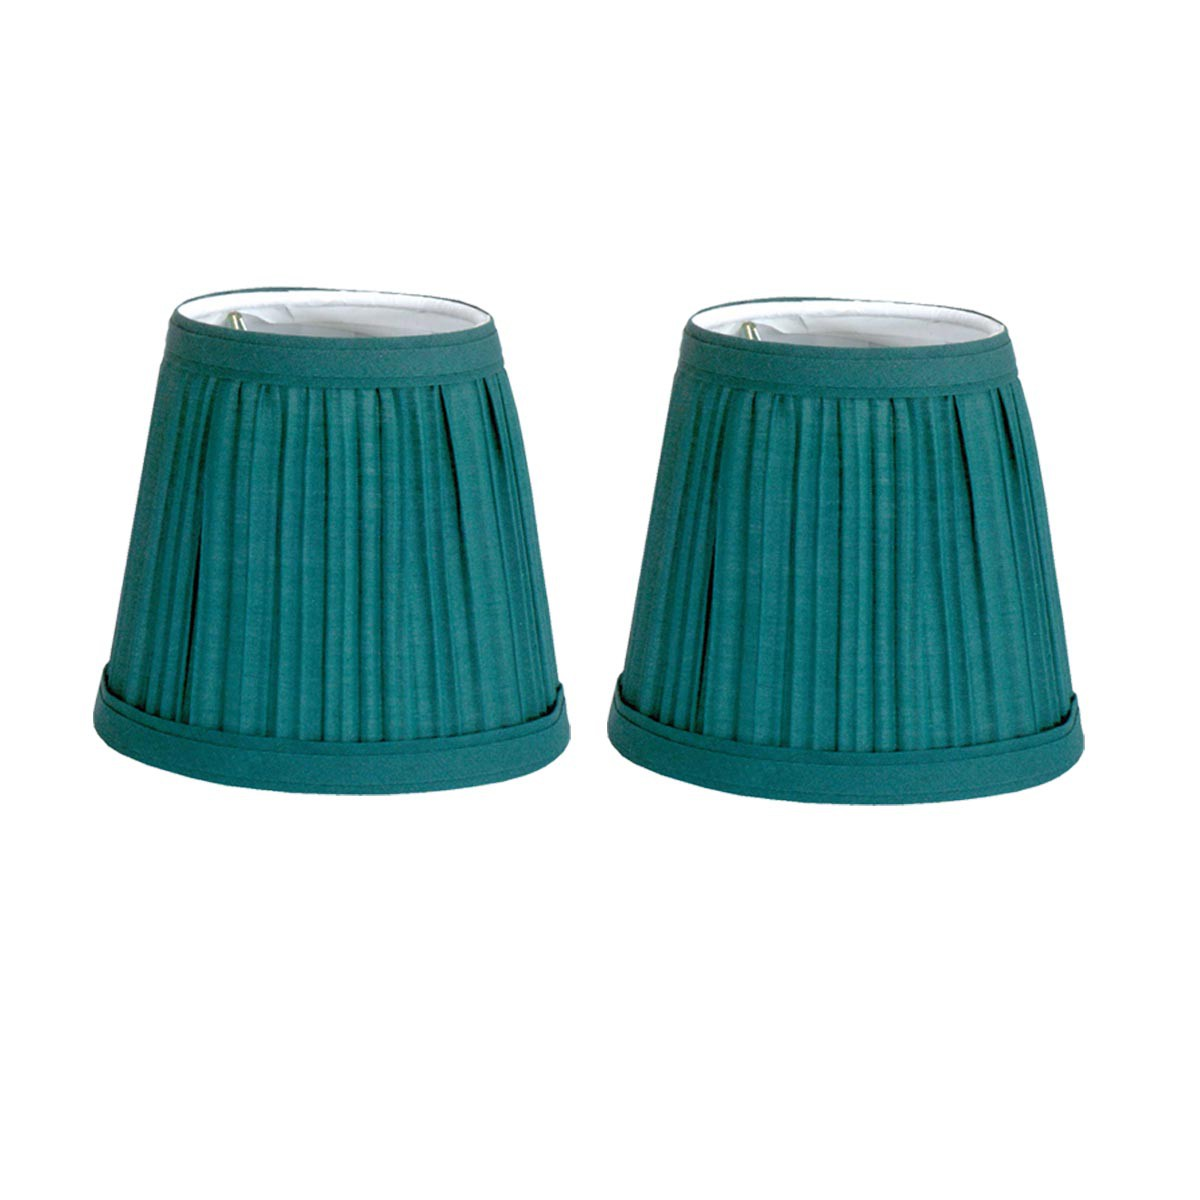 Fabric lamp shade hunter green 4 116 h mini clip 2 fabric lamp shade hunter green 4 116 h mini clip mozeypictures Gallery